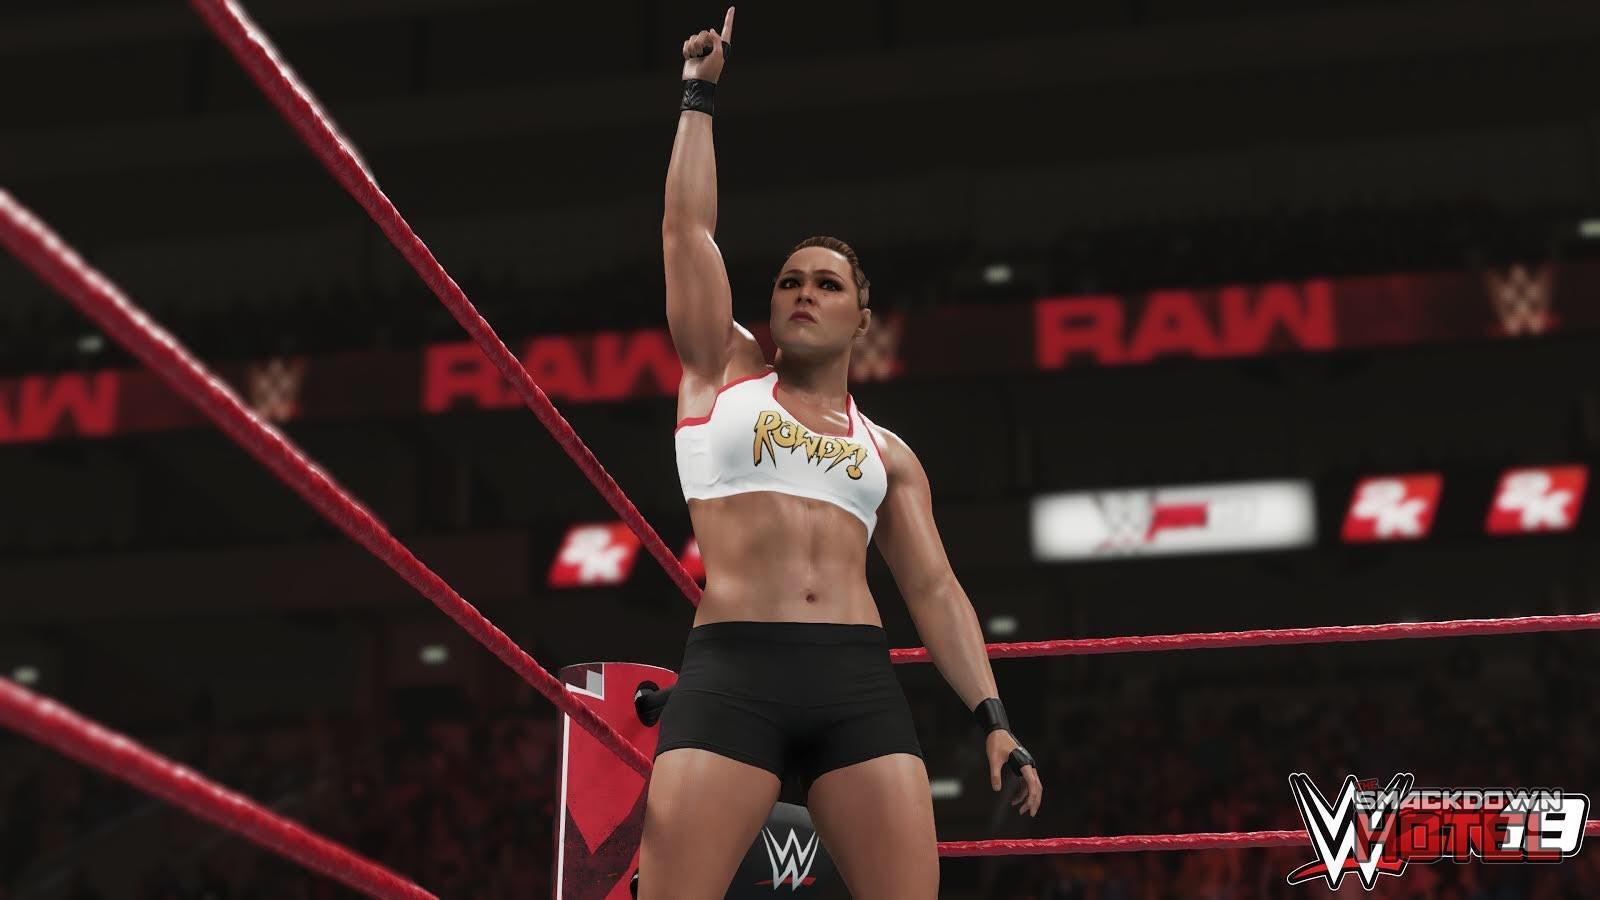 WWE2K19_Ronda_Rousey_Raw-15292-1080.jpg